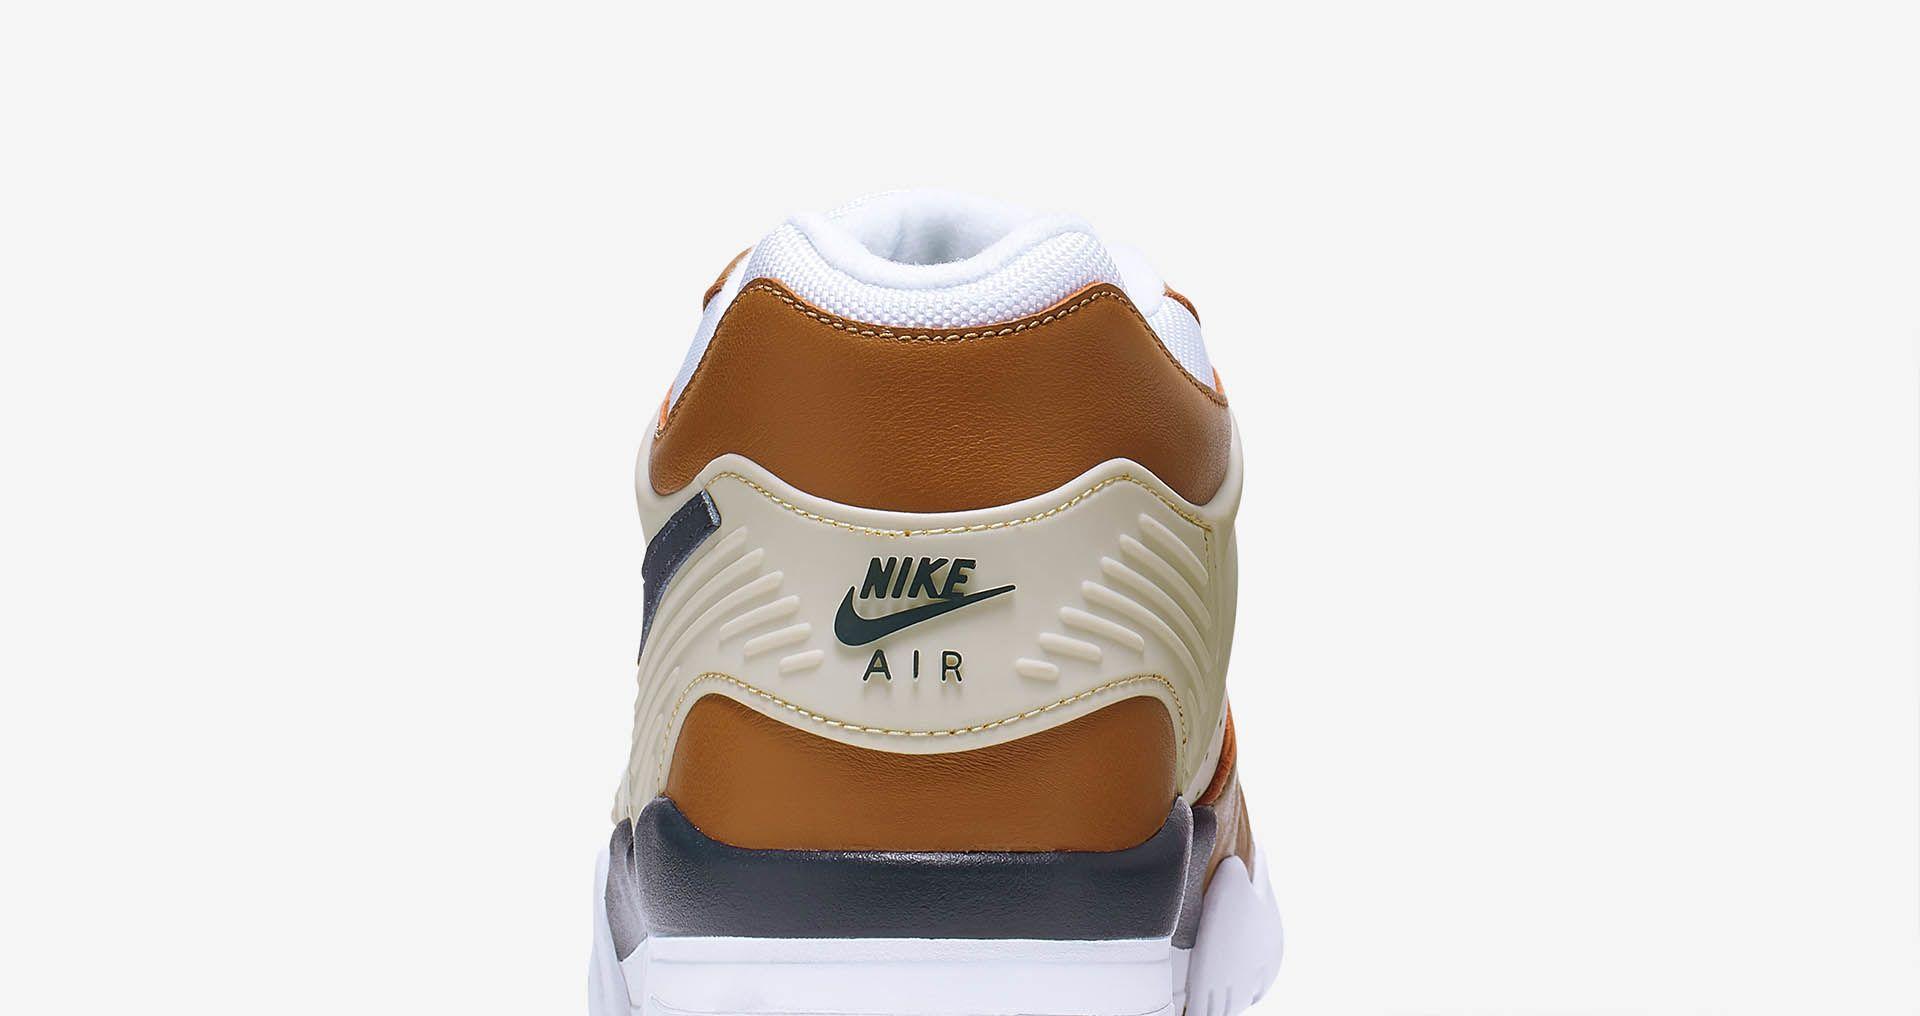 cb4ea88217e0 Nike Air Trainer 3  Medicine Ball  Release Date. Nike+ SNKRS